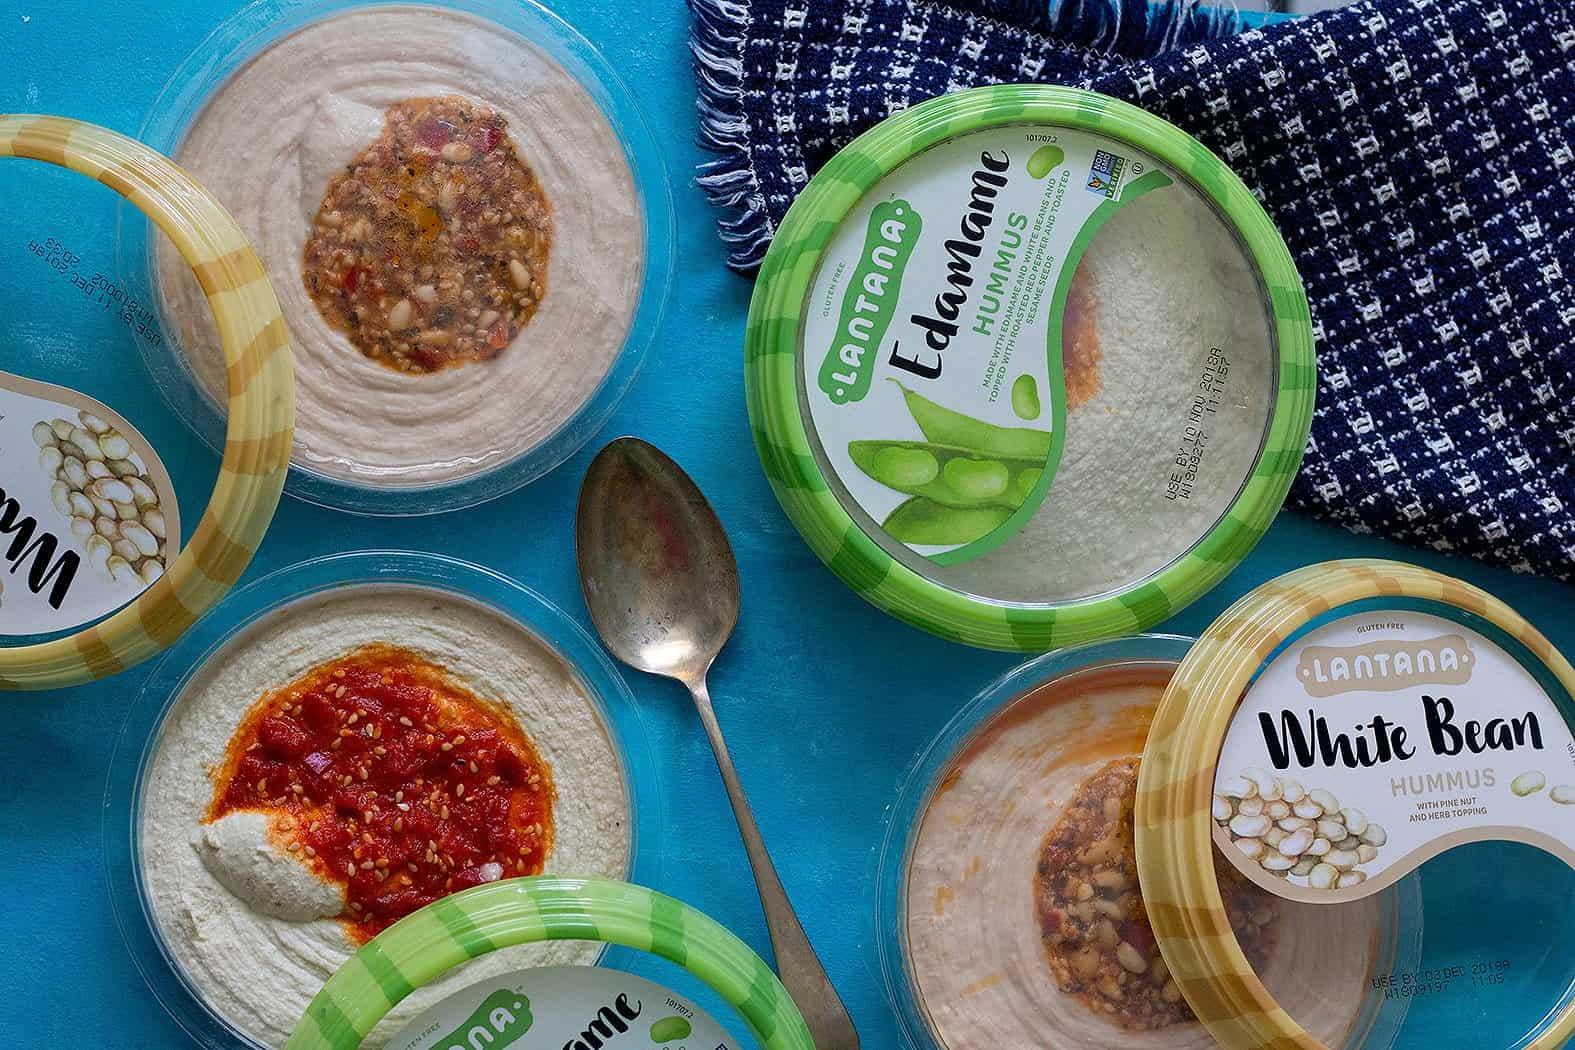 Hummus is a good option as an appetizer.